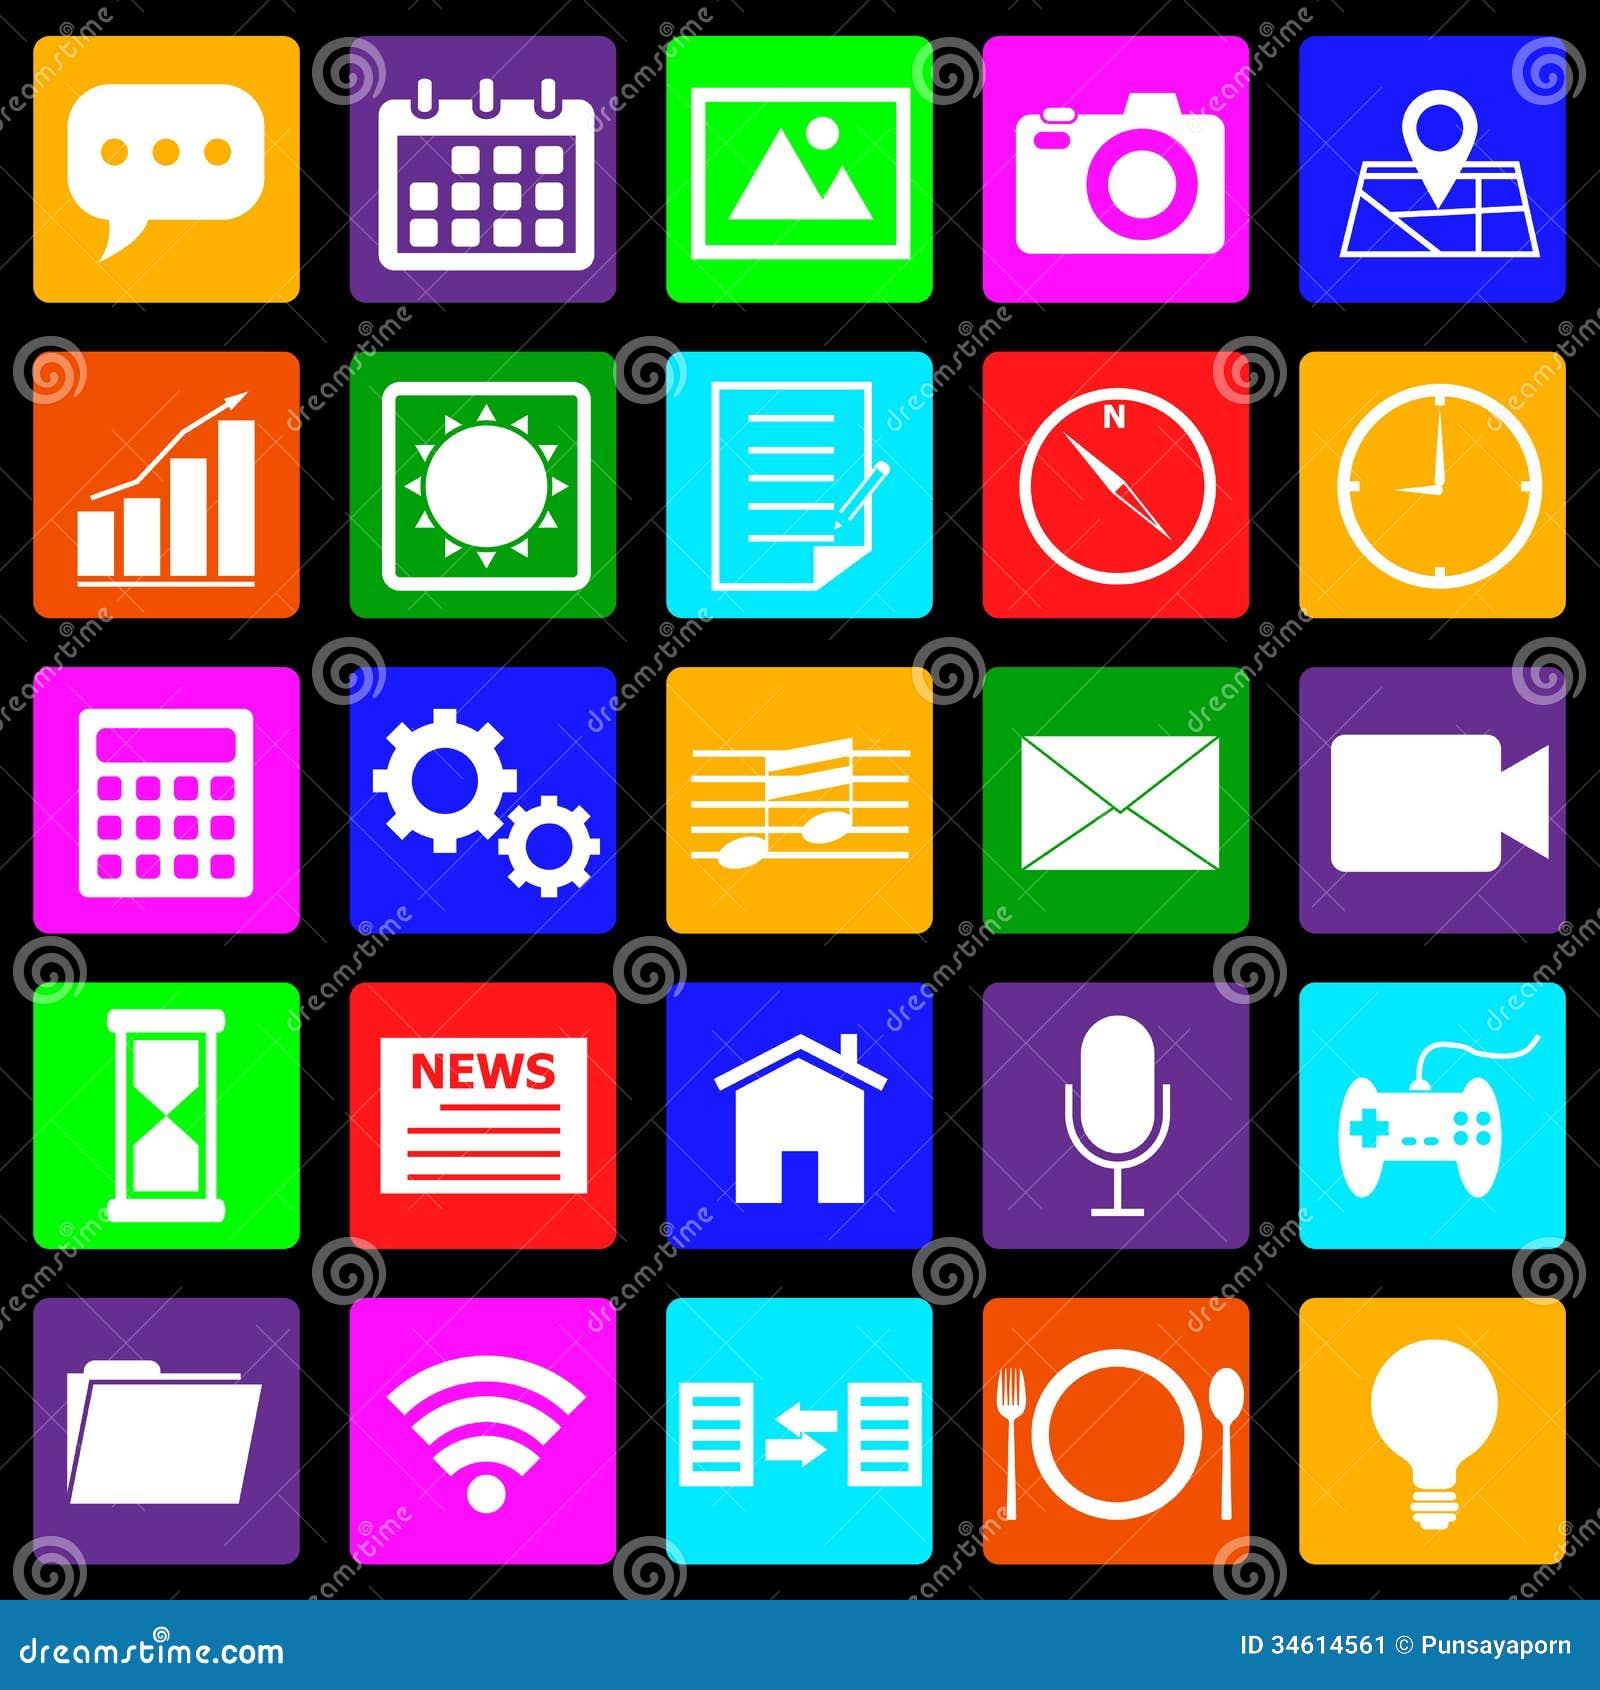 Contoh Aplikasi Berbasis Android | Kumpulan contoh